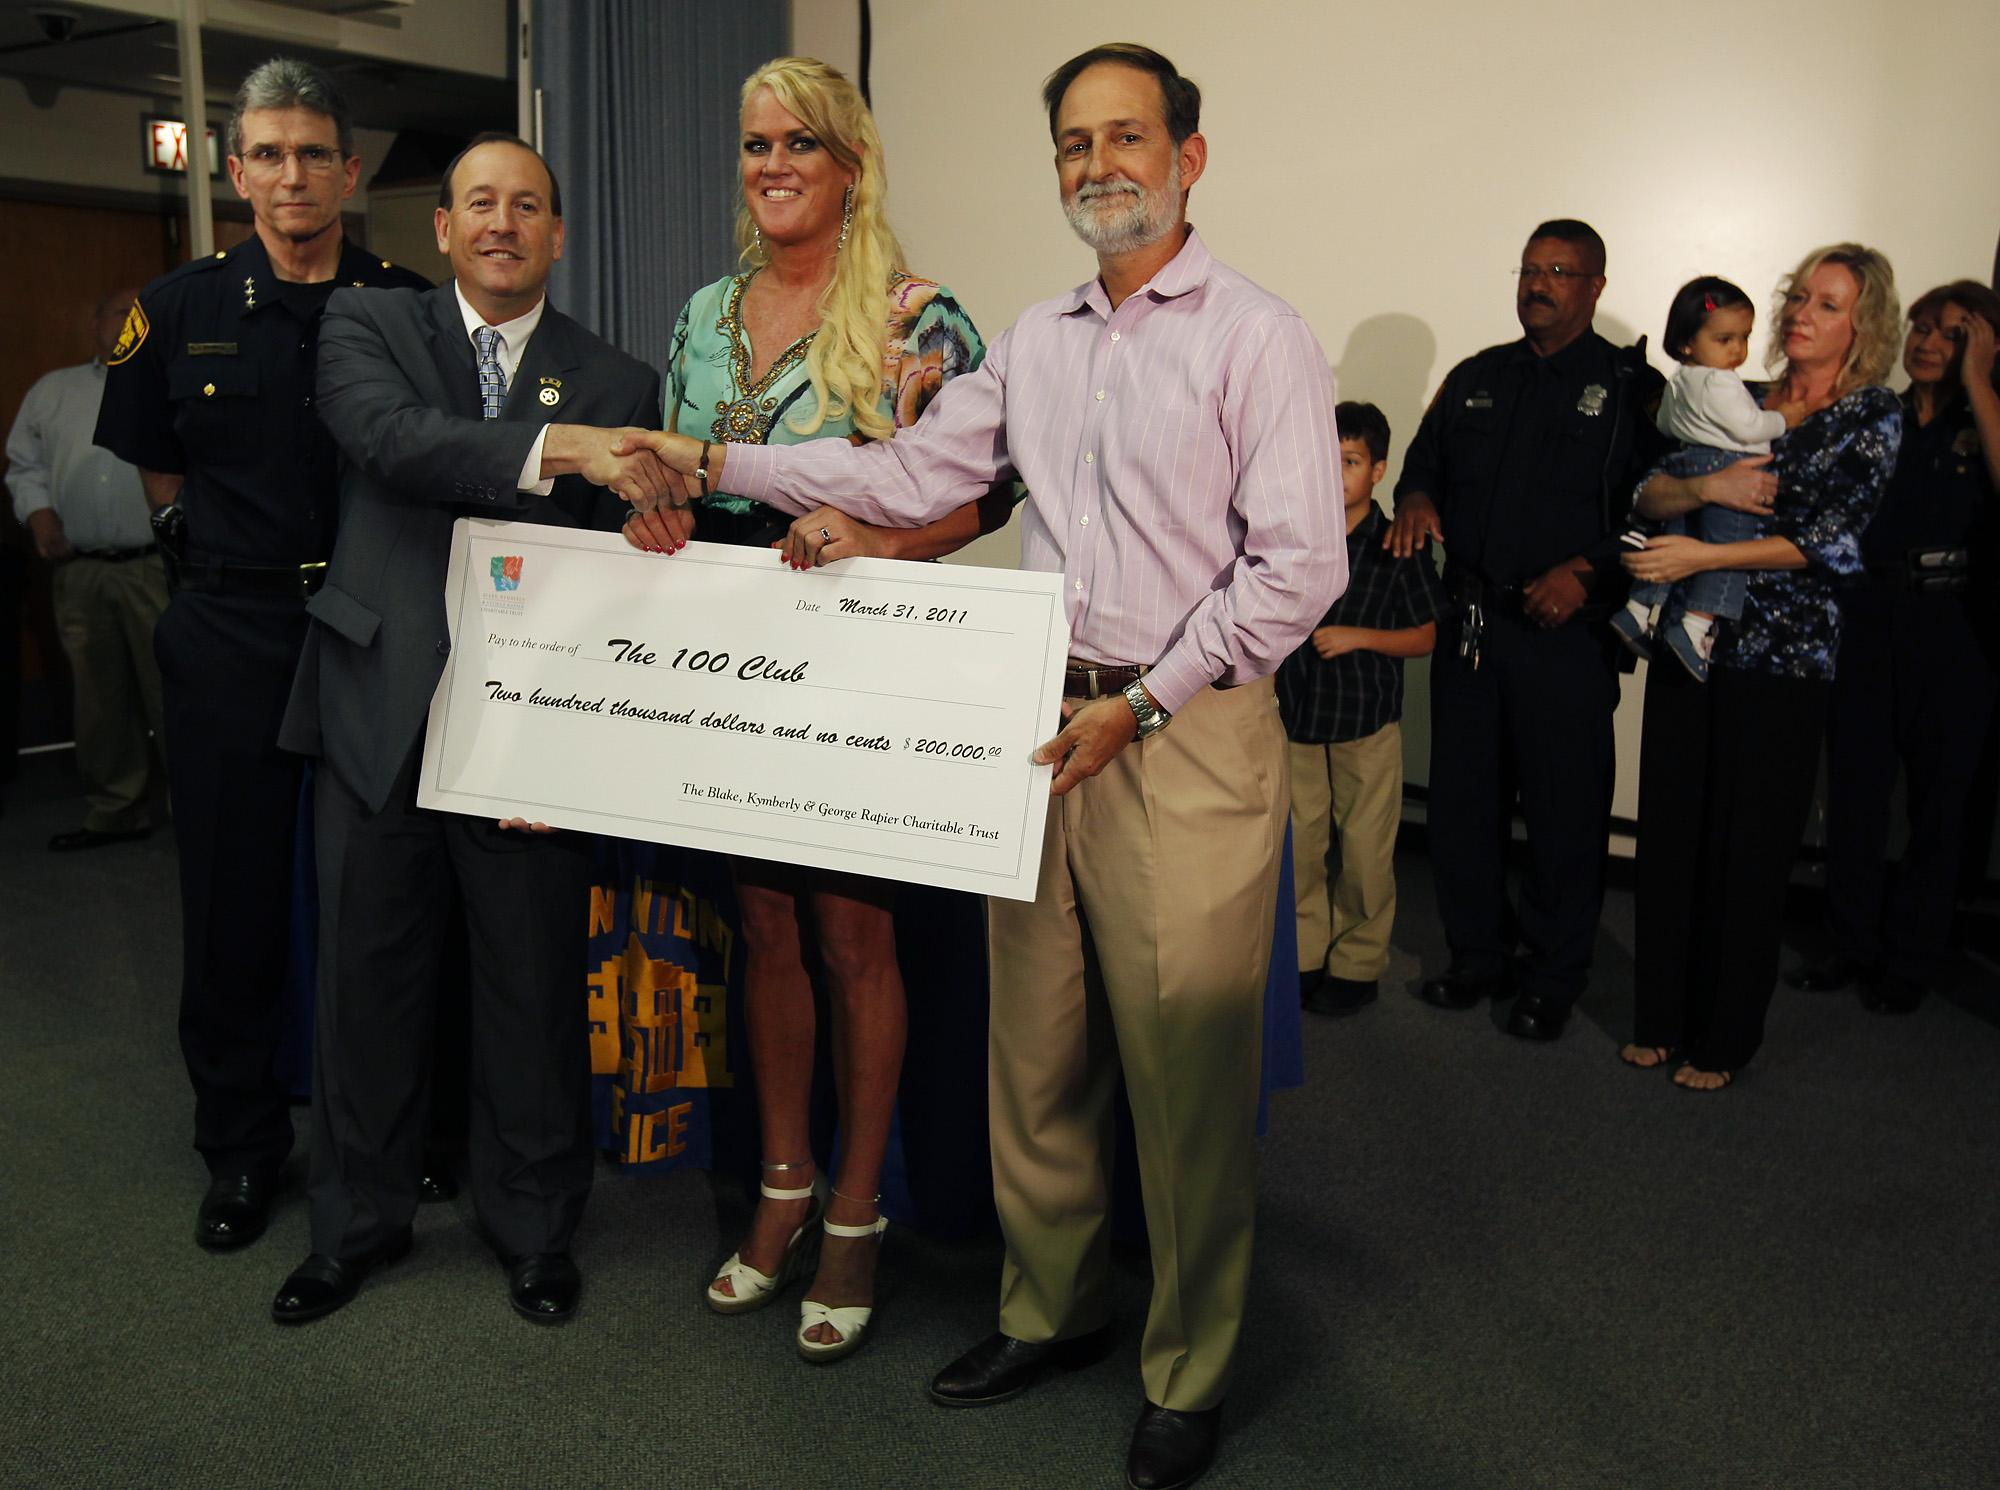 Local Philanthropist Bears Gifts Totalling 800 000 San Antonio Express News